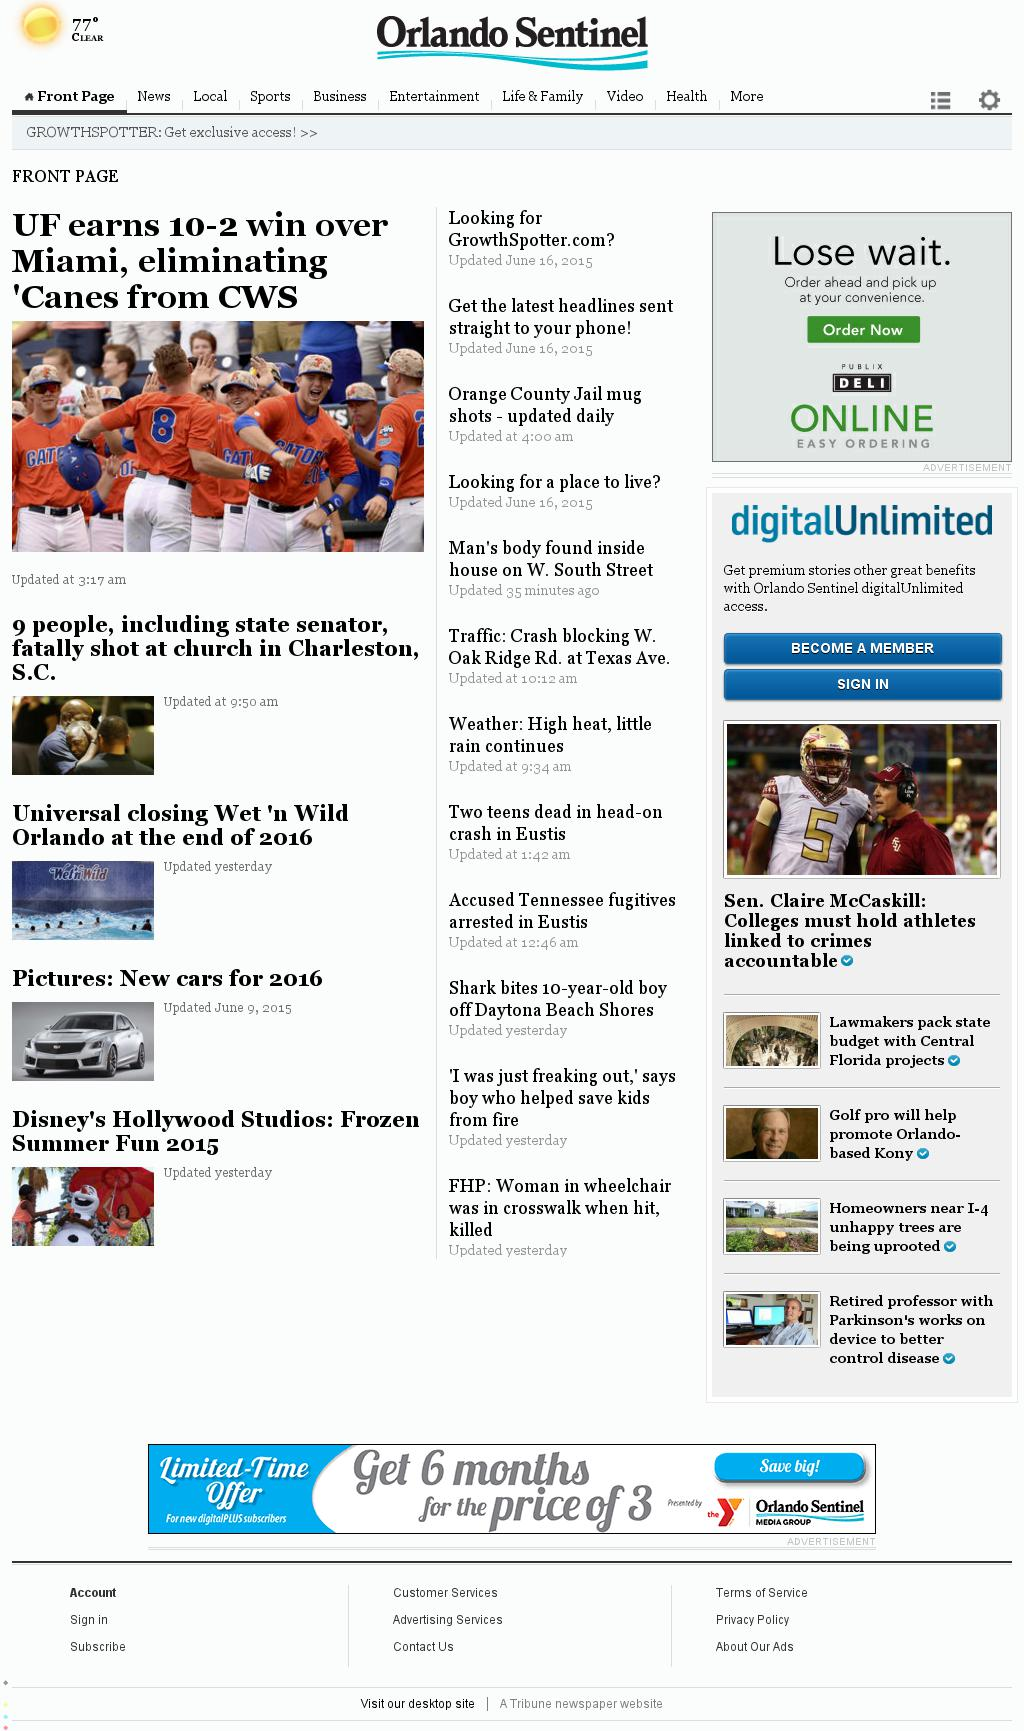 Orlando Sentinel at Thursday June 18, 2015, 11:17 a.m. UTC